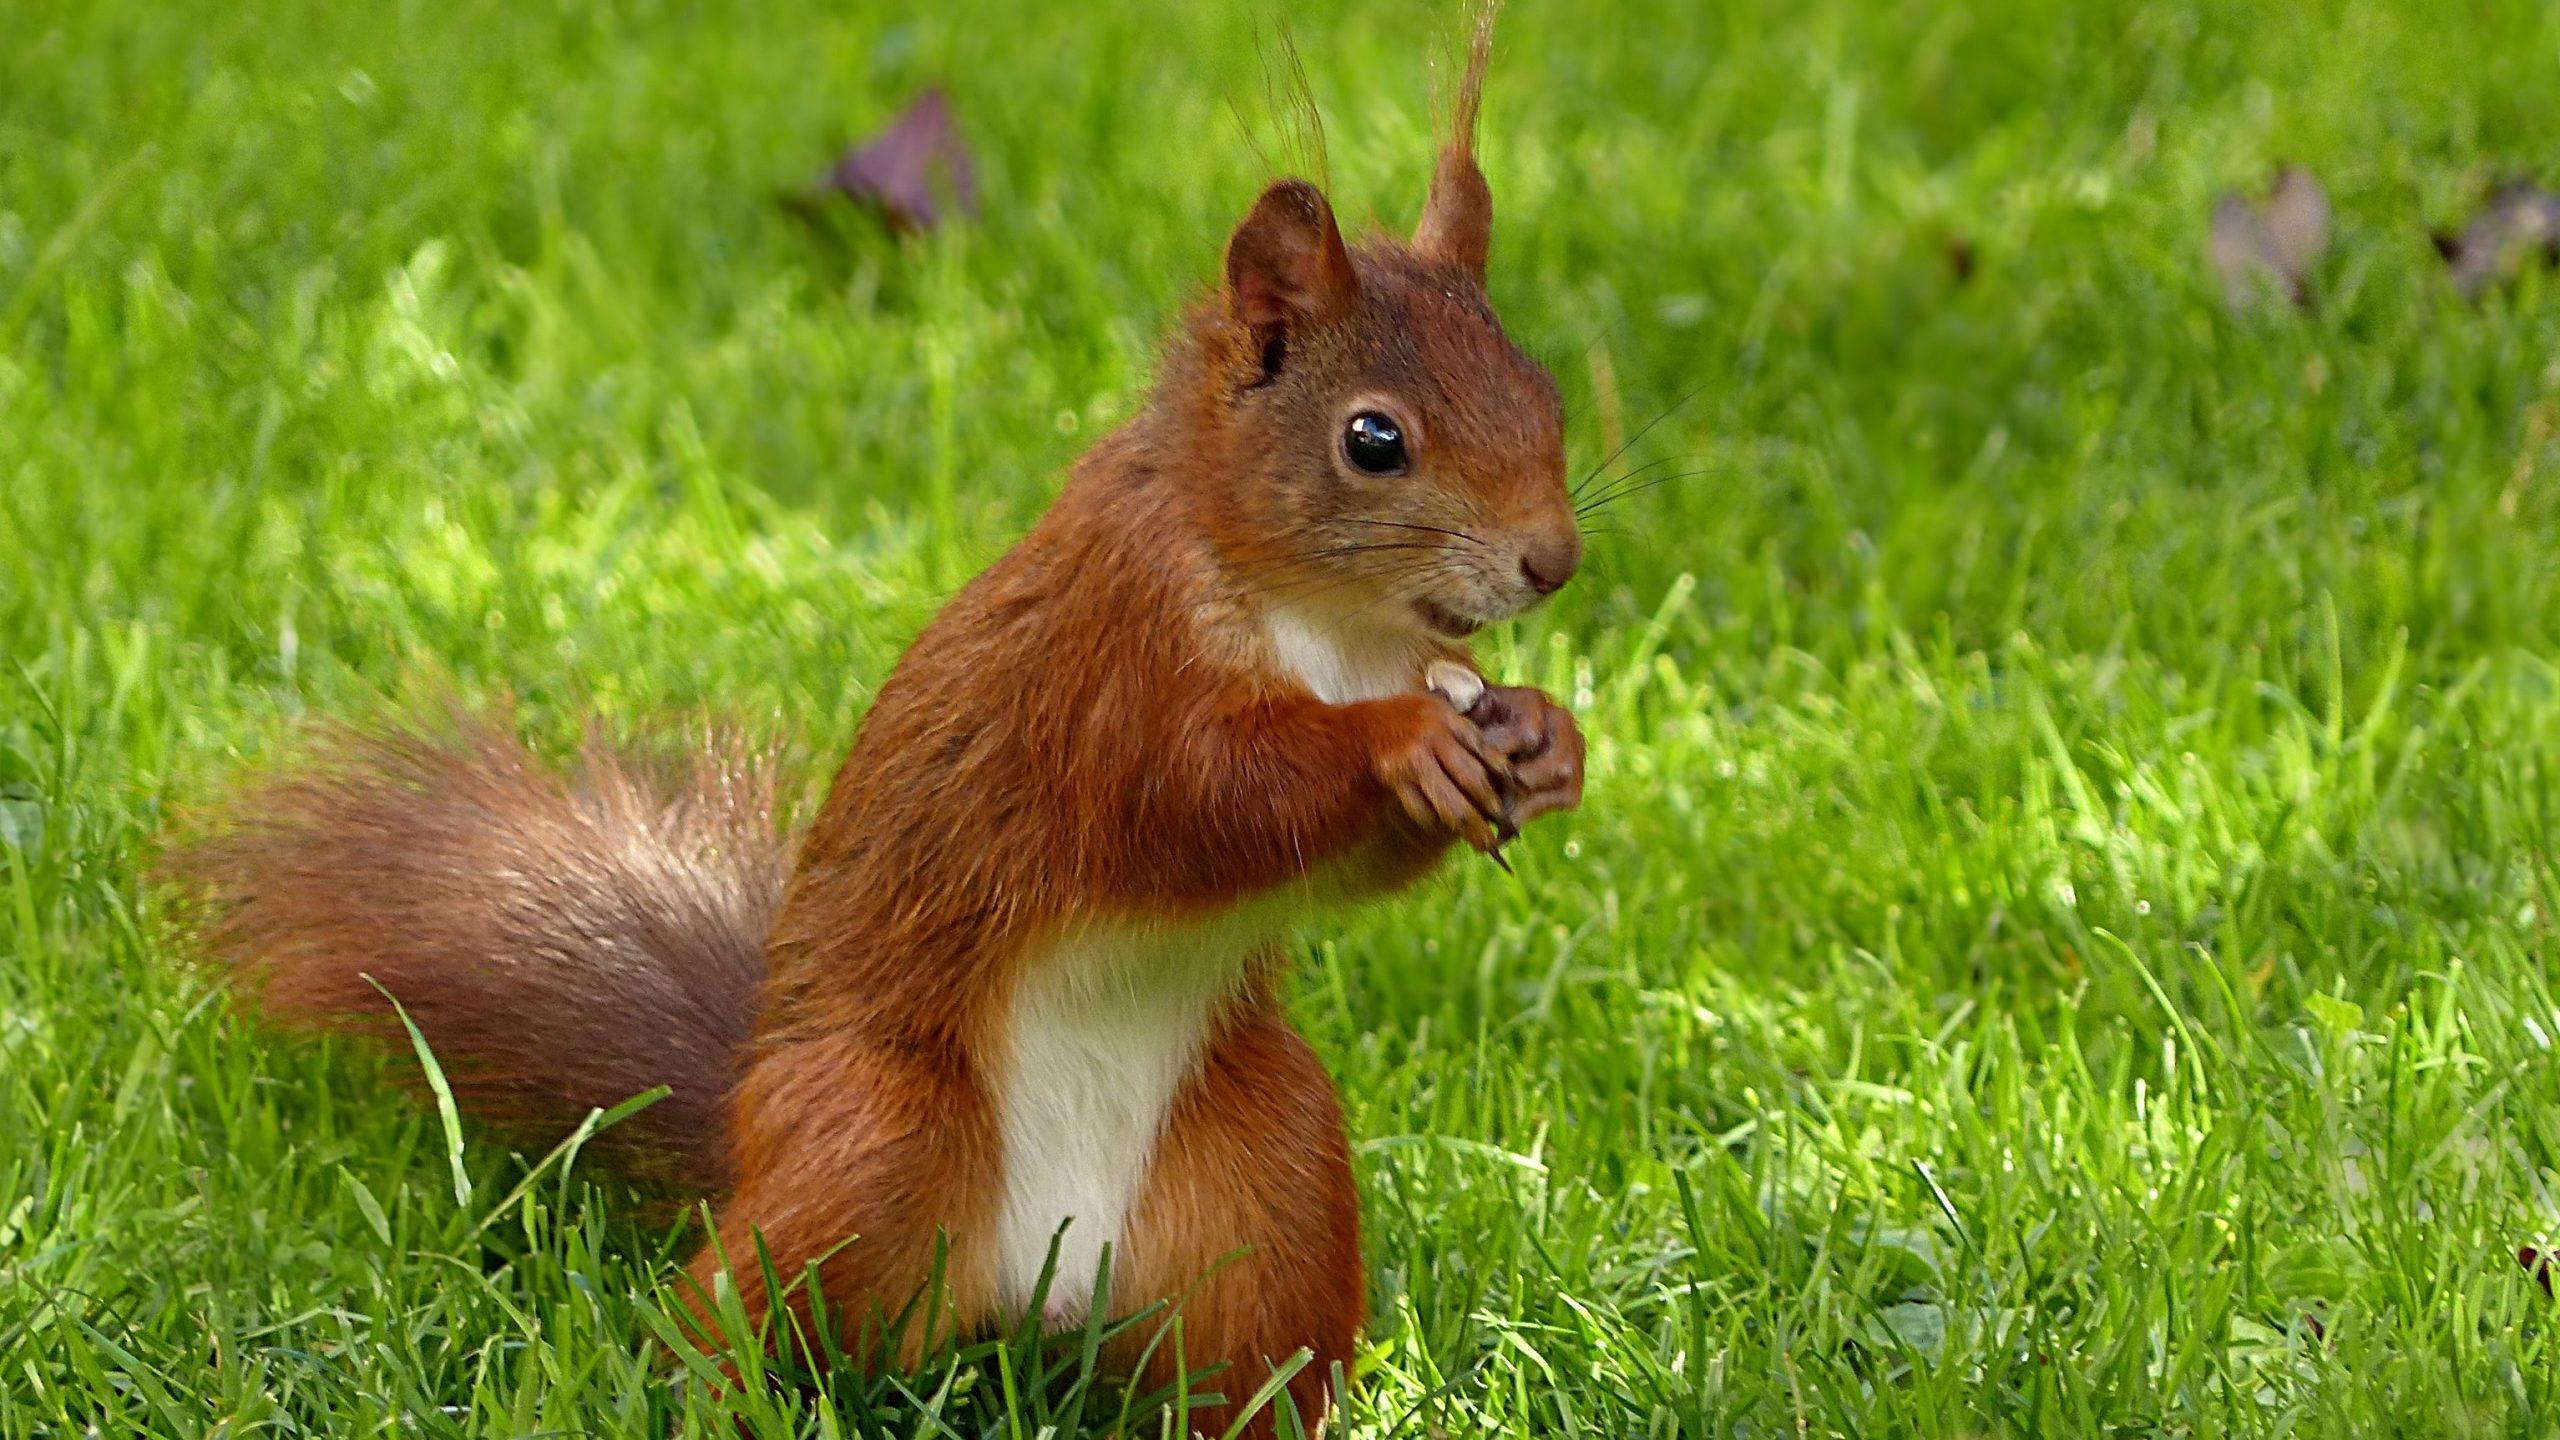 Fall Tree Desktop Wallpaper Squirrel Wallpaper Hd Wallpaper Background